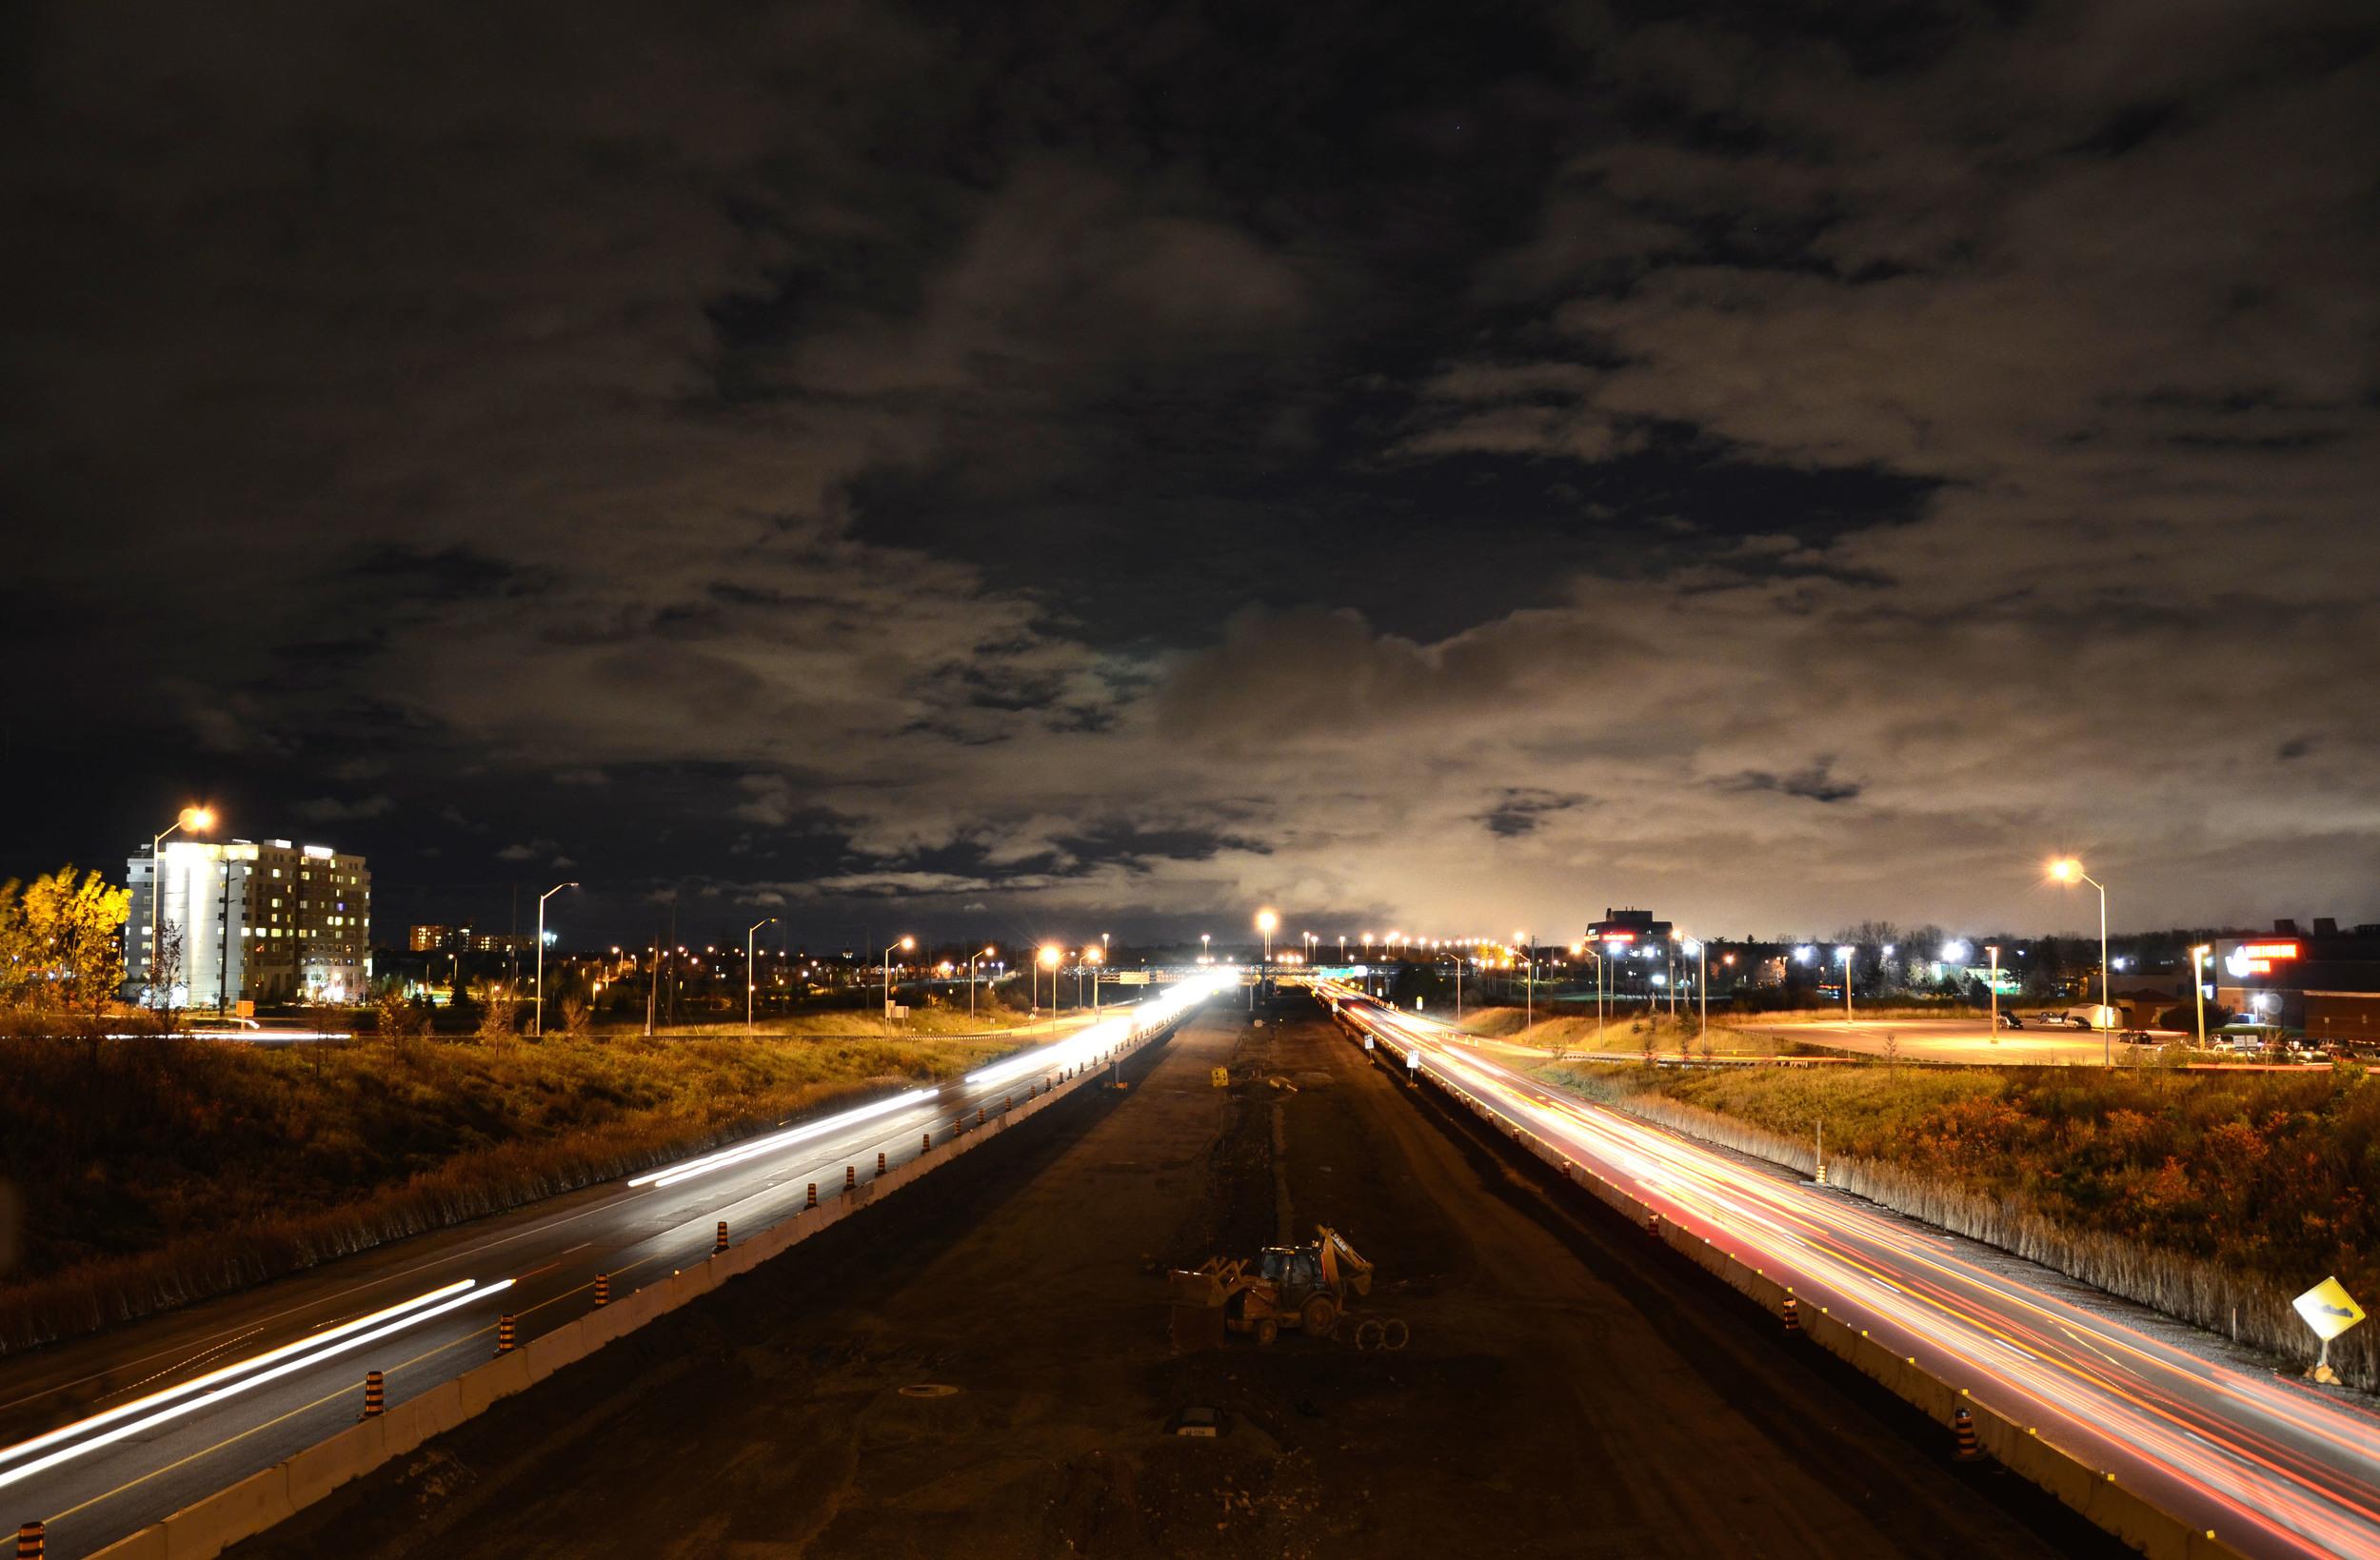 Jenkins, Cheyenne. Busy Streets . 2012. Digital Photography. Ottawa, Ontario